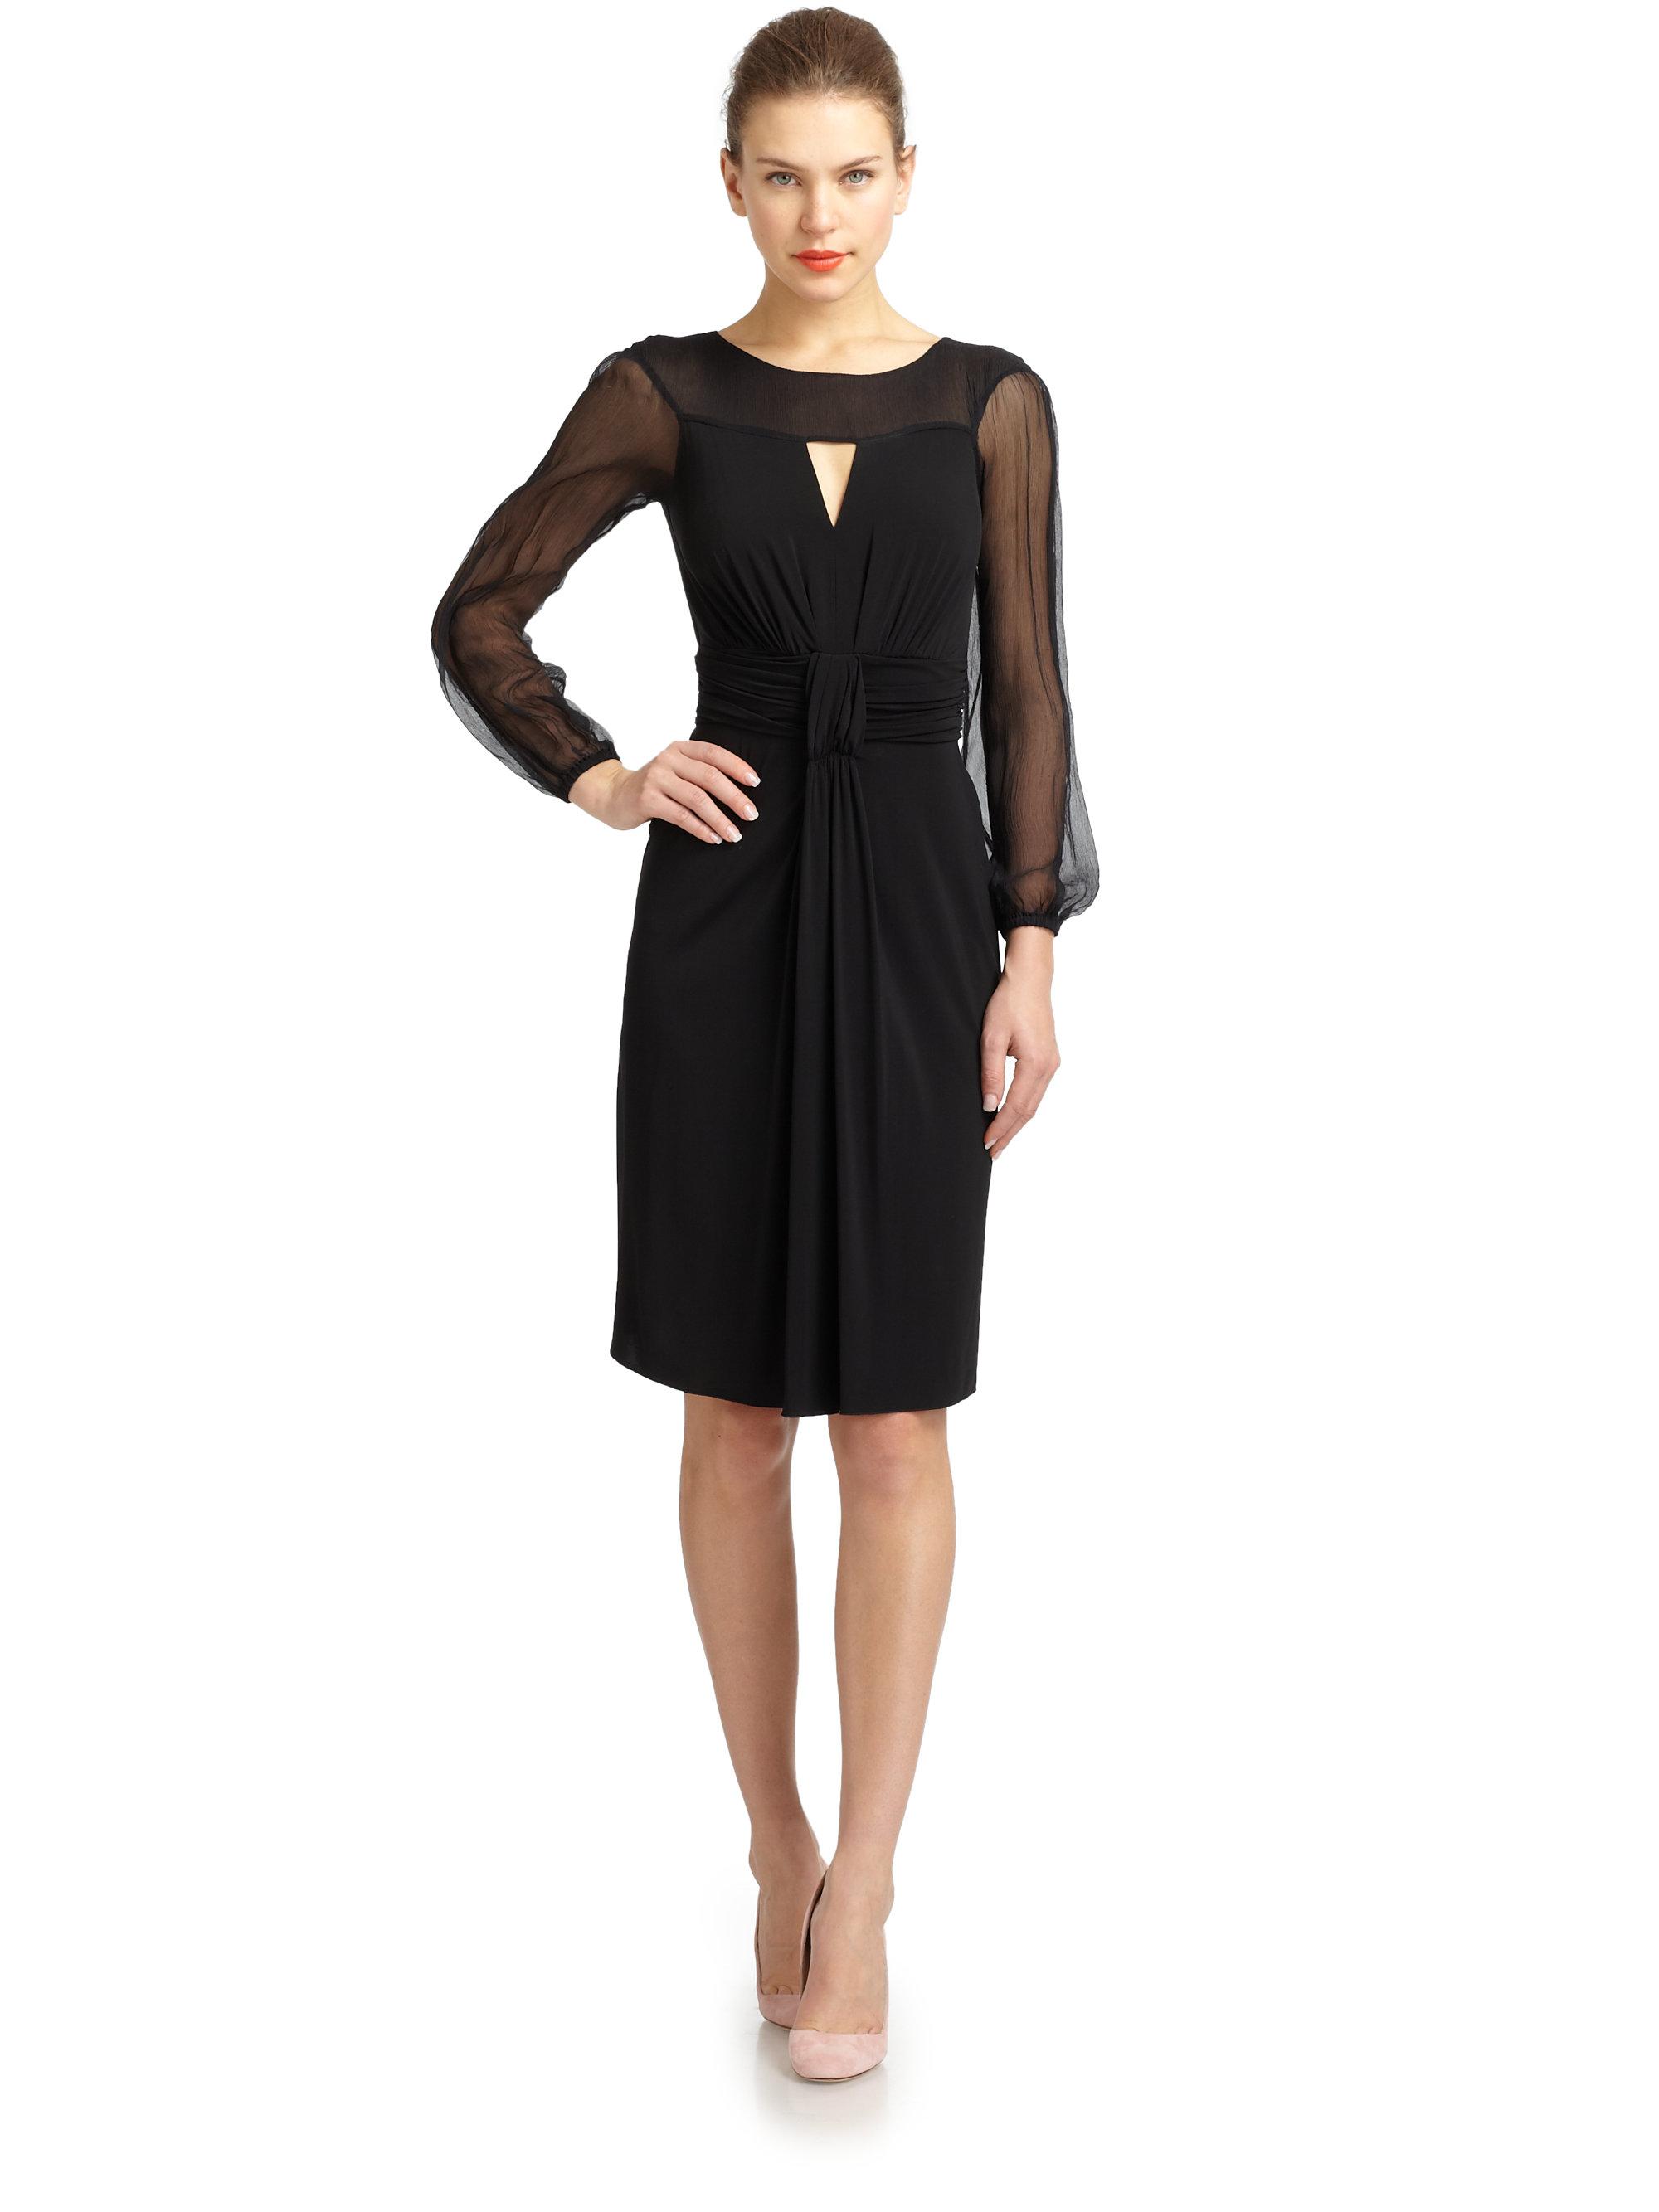 Philosophy di alberta ferretti black dress